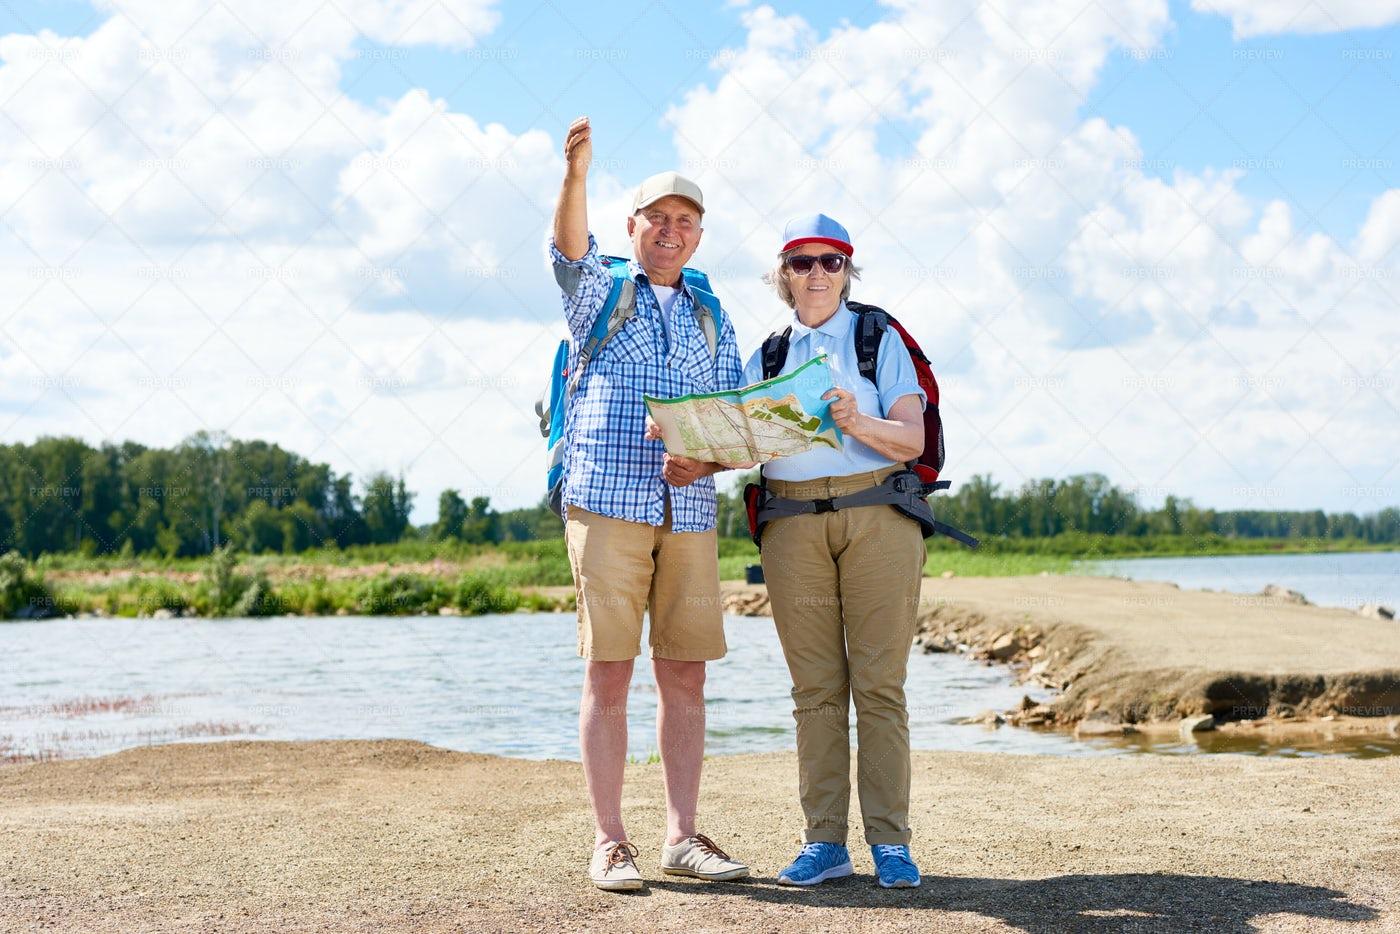 Couple Of Active Senior Travelers...: Stock Photos